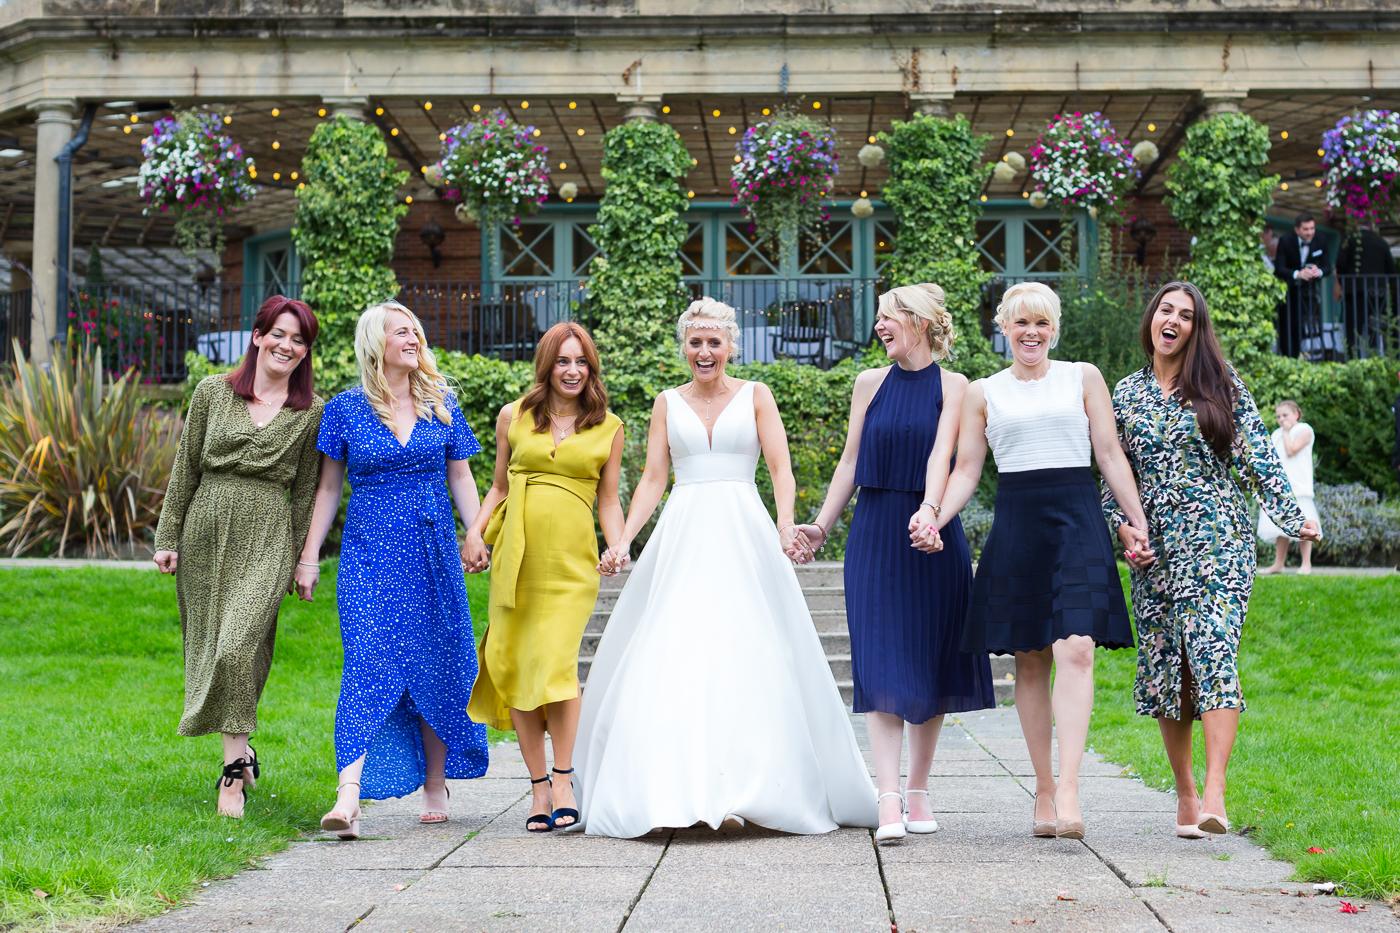 sun pavilion harrogate wedding photographer Amanda Manby